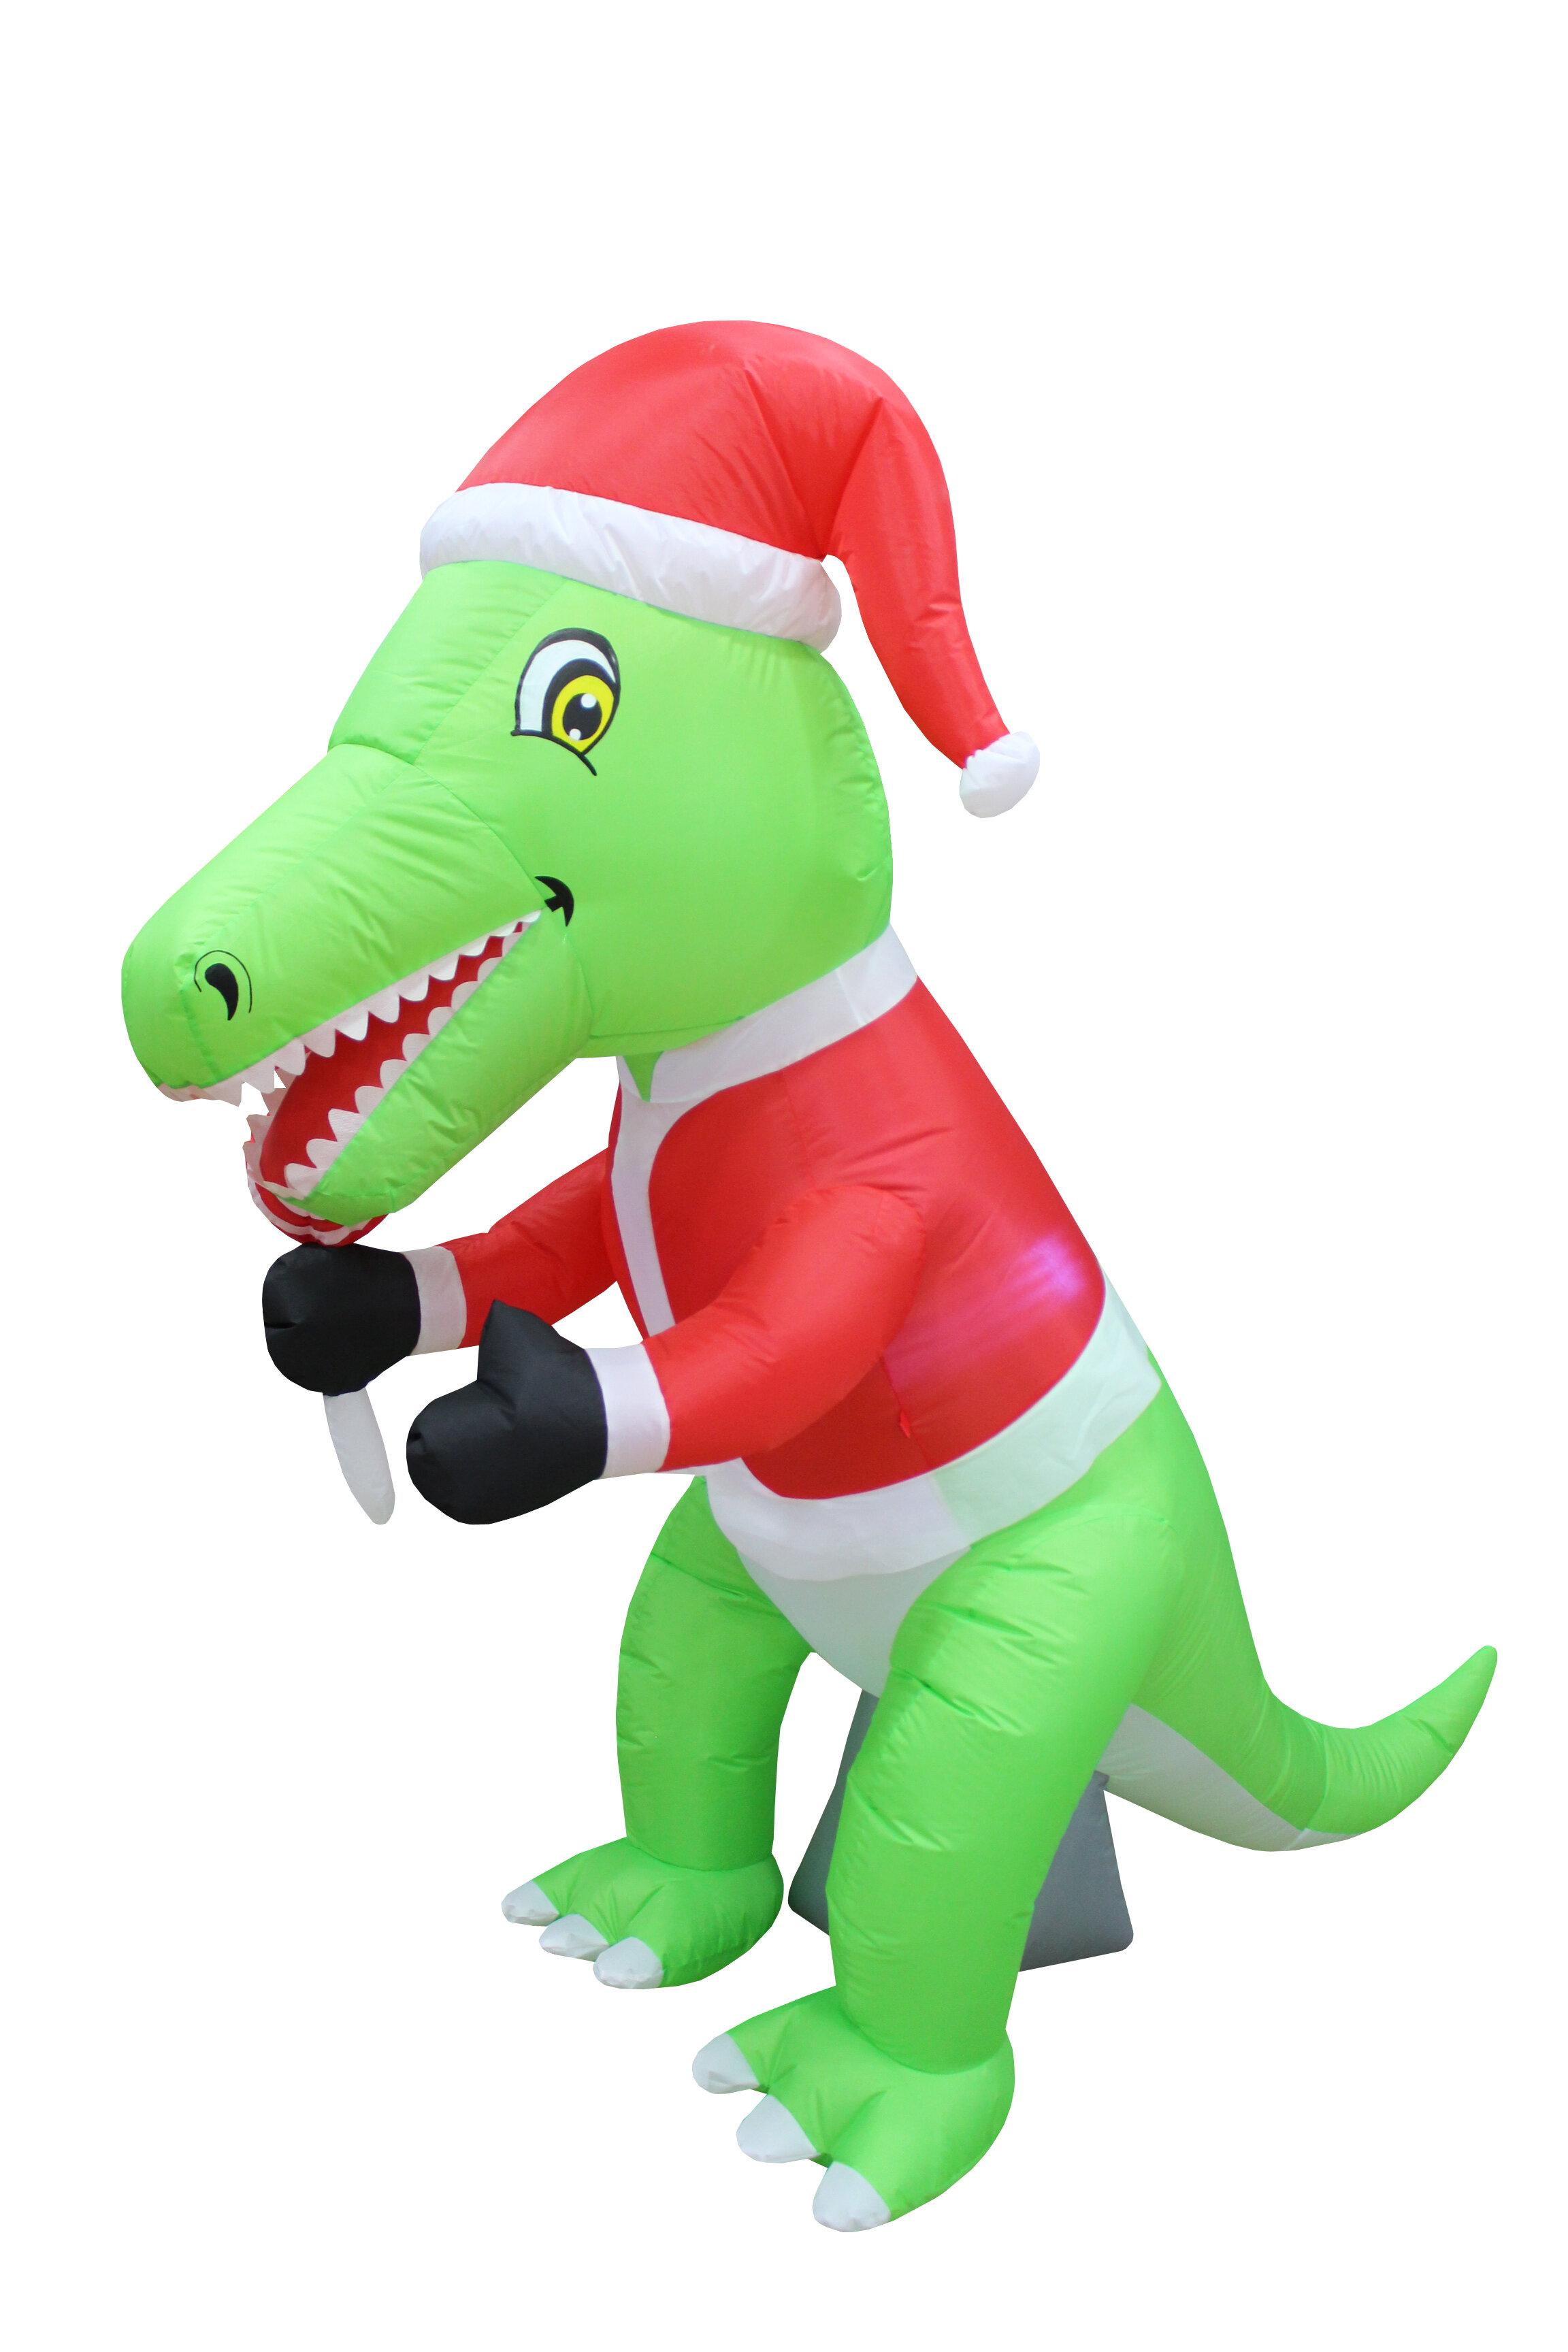 Dinosaur Christmas.Dinosaur Christmas Inflatable